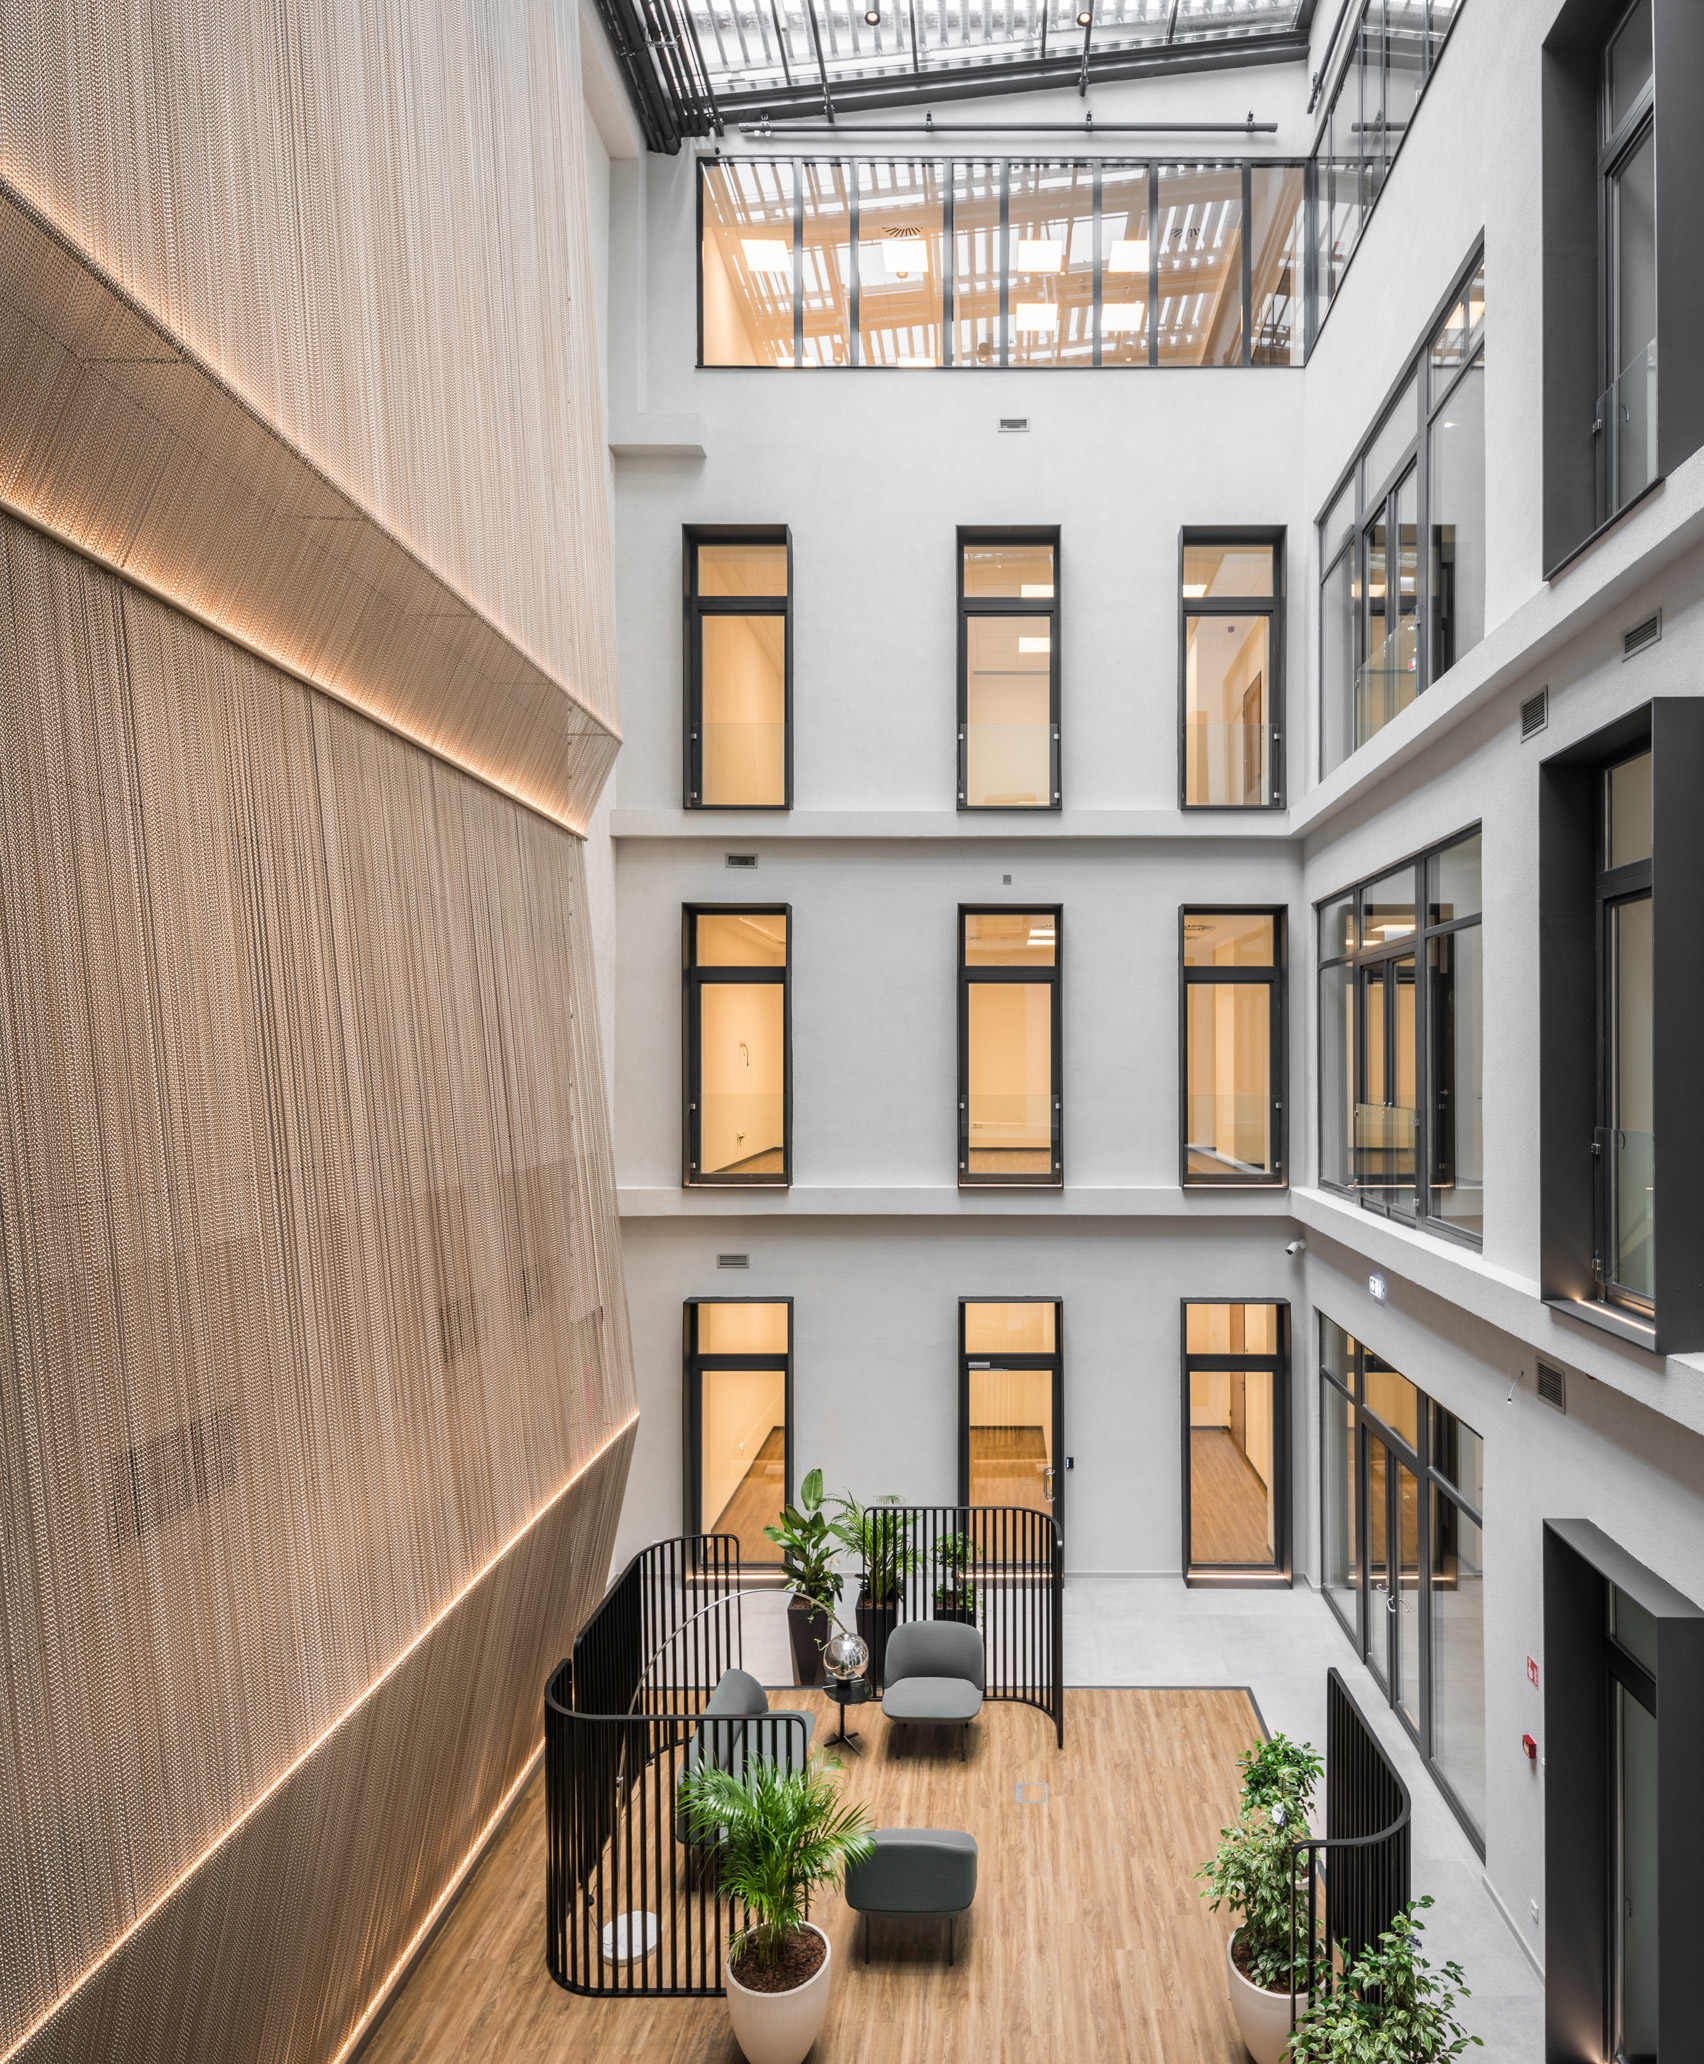 Kriskadecor installed at KI20 Business Centre by MadiLancos Studio.